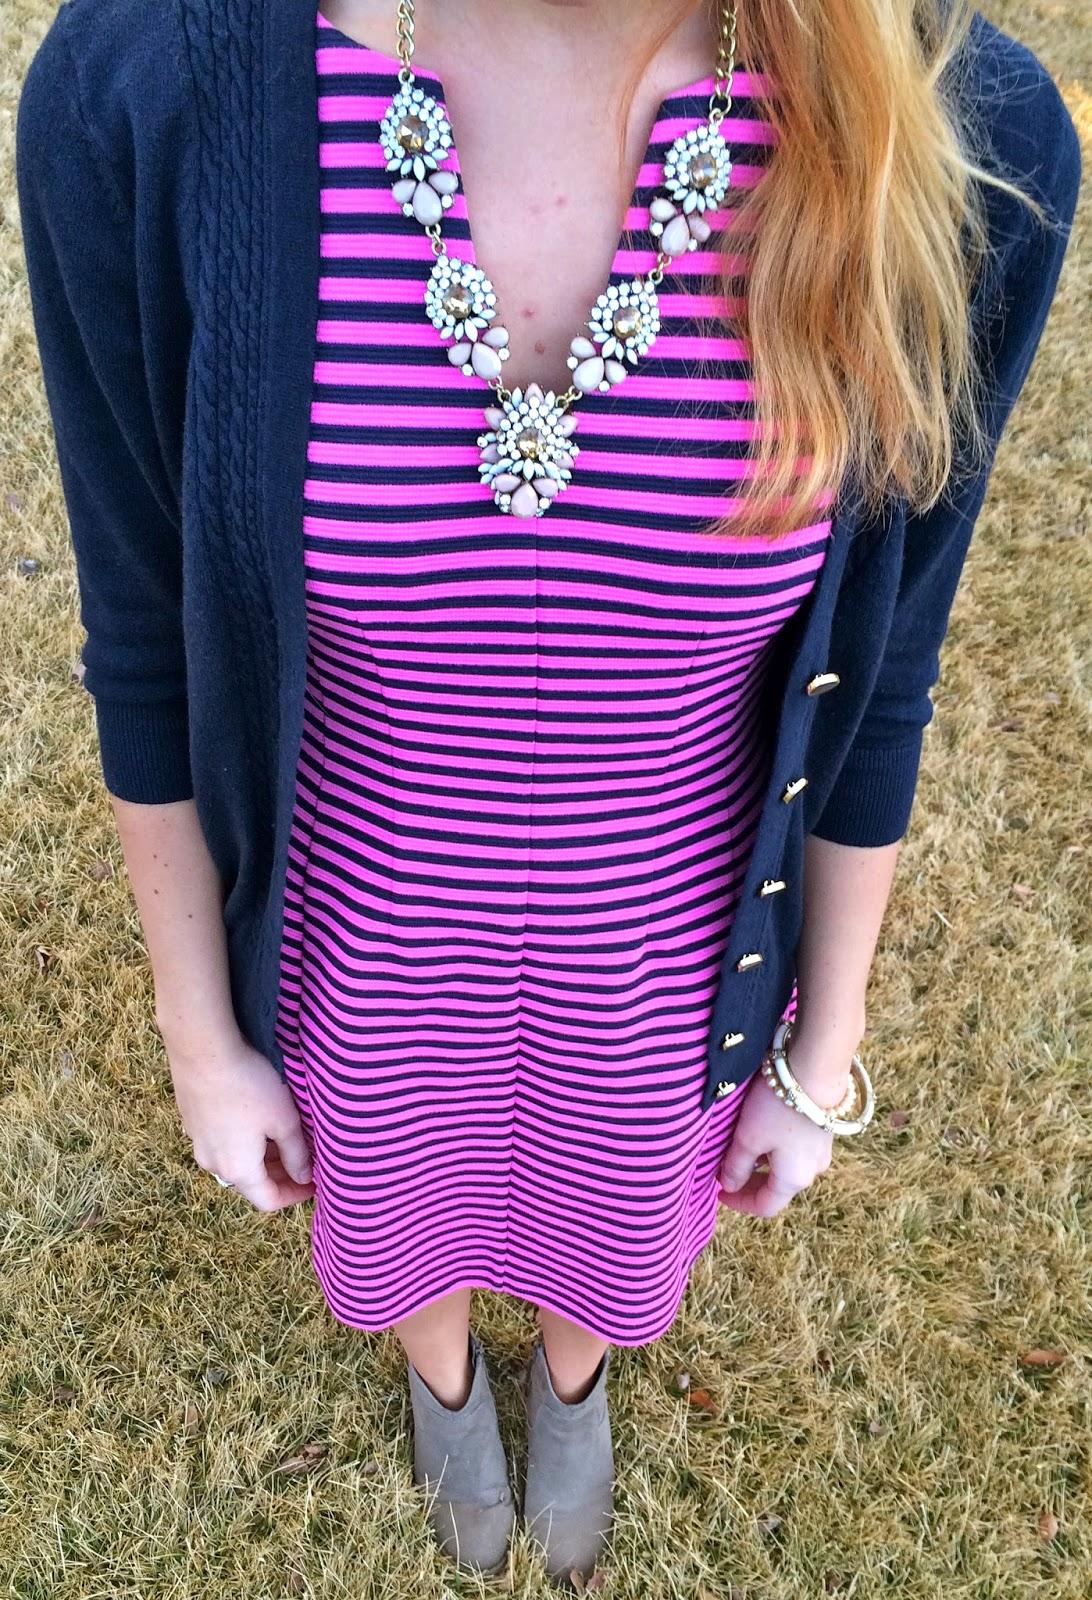 Sweet Bananie: wine and a pretty dress + sweater #27